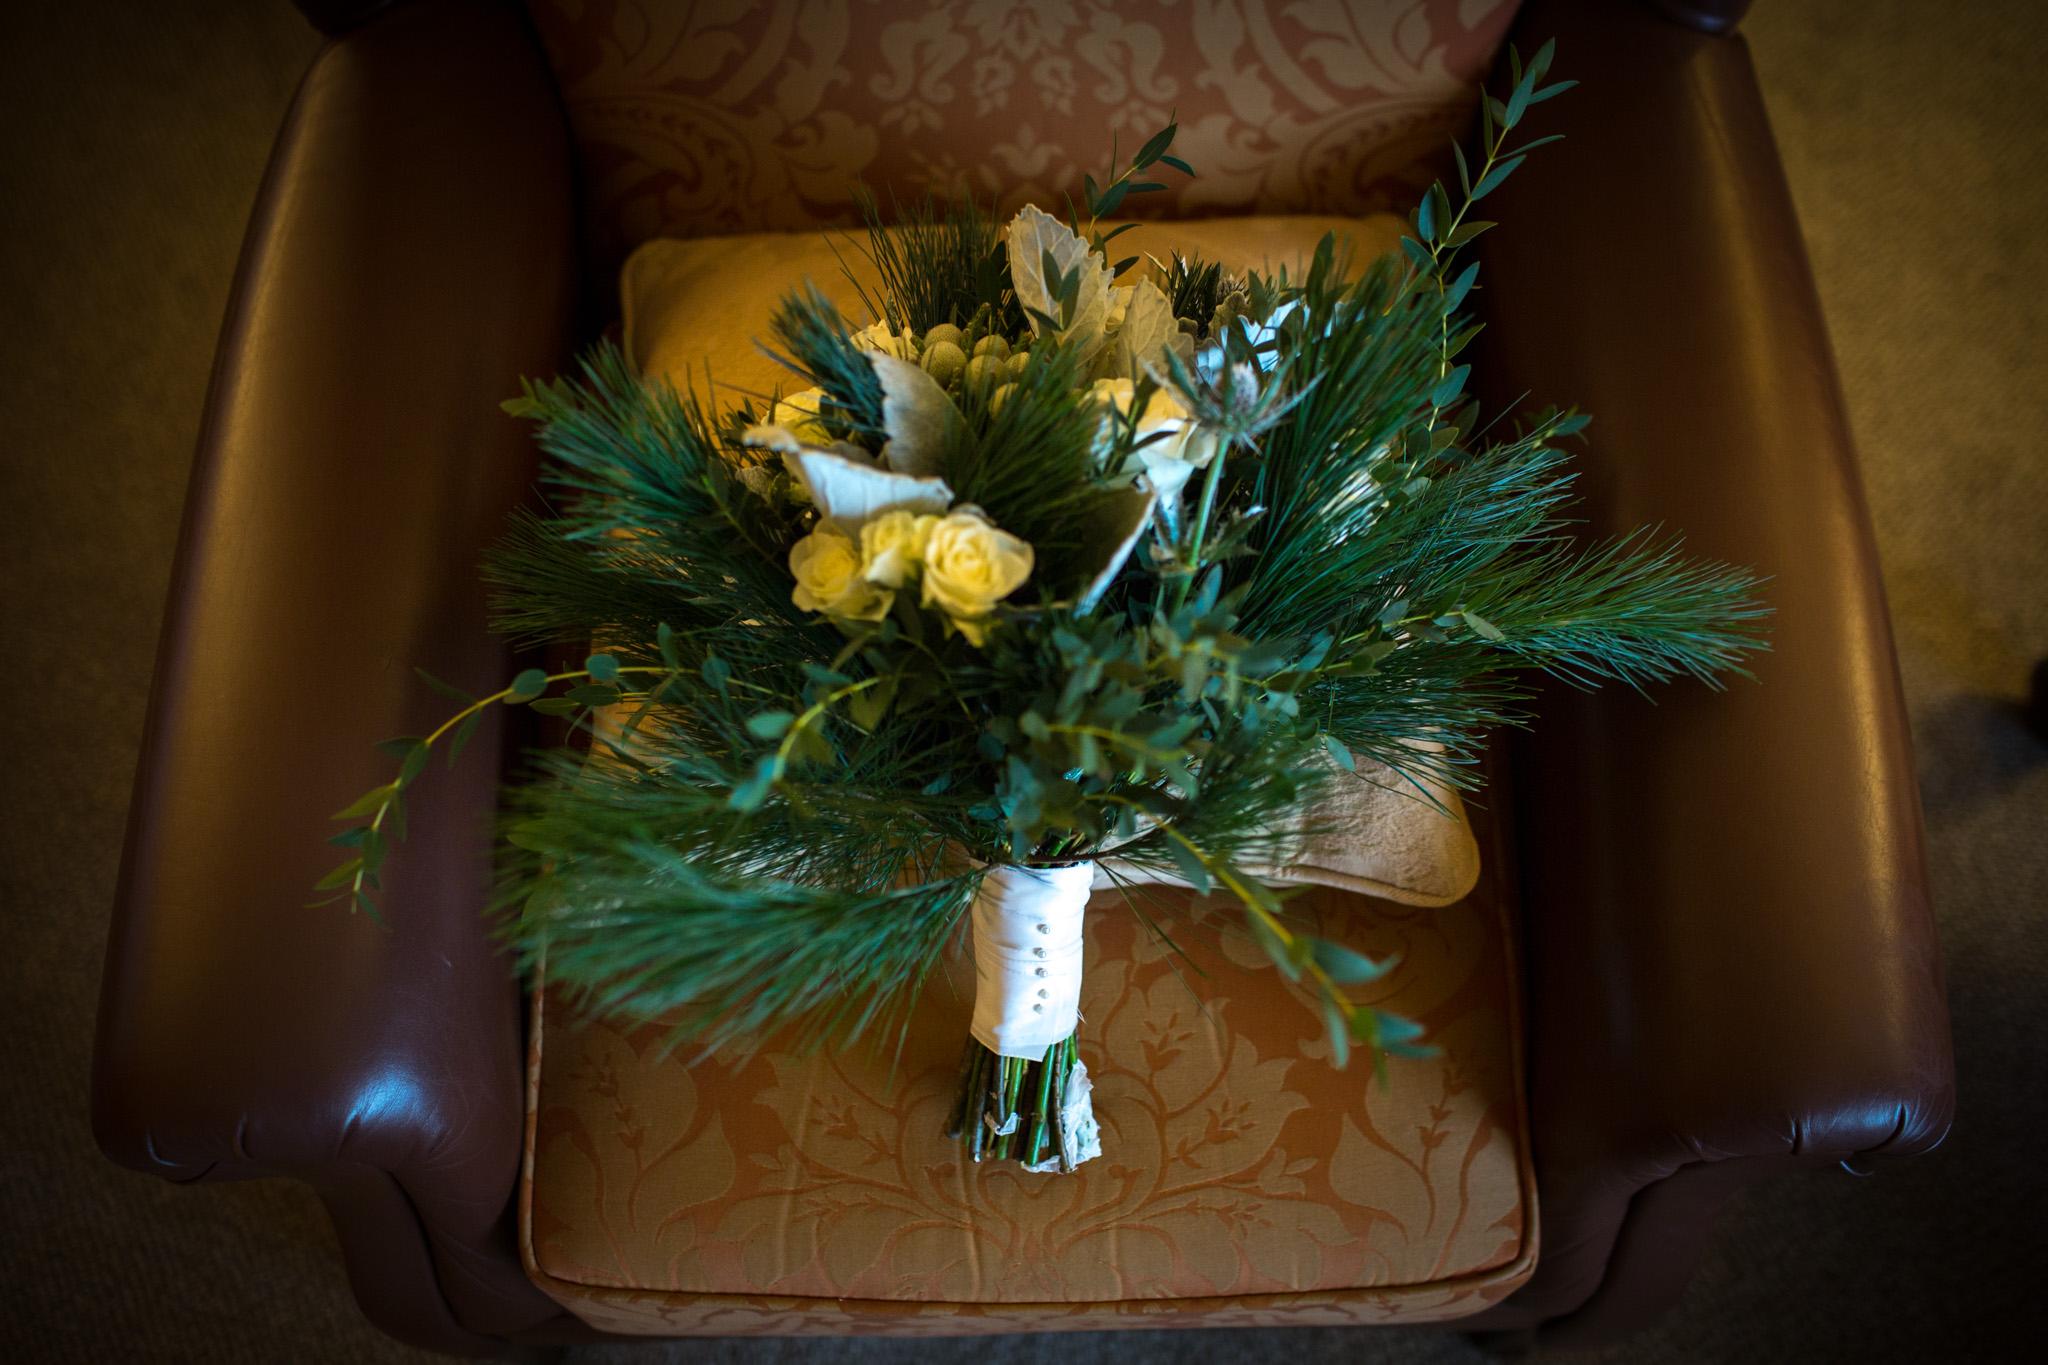 Mark_Barnes_Northern_Ireland_wedding_photographer_Harveys_Point_Donegall_Wedding_photography-Adam&Gemma-5.jpg